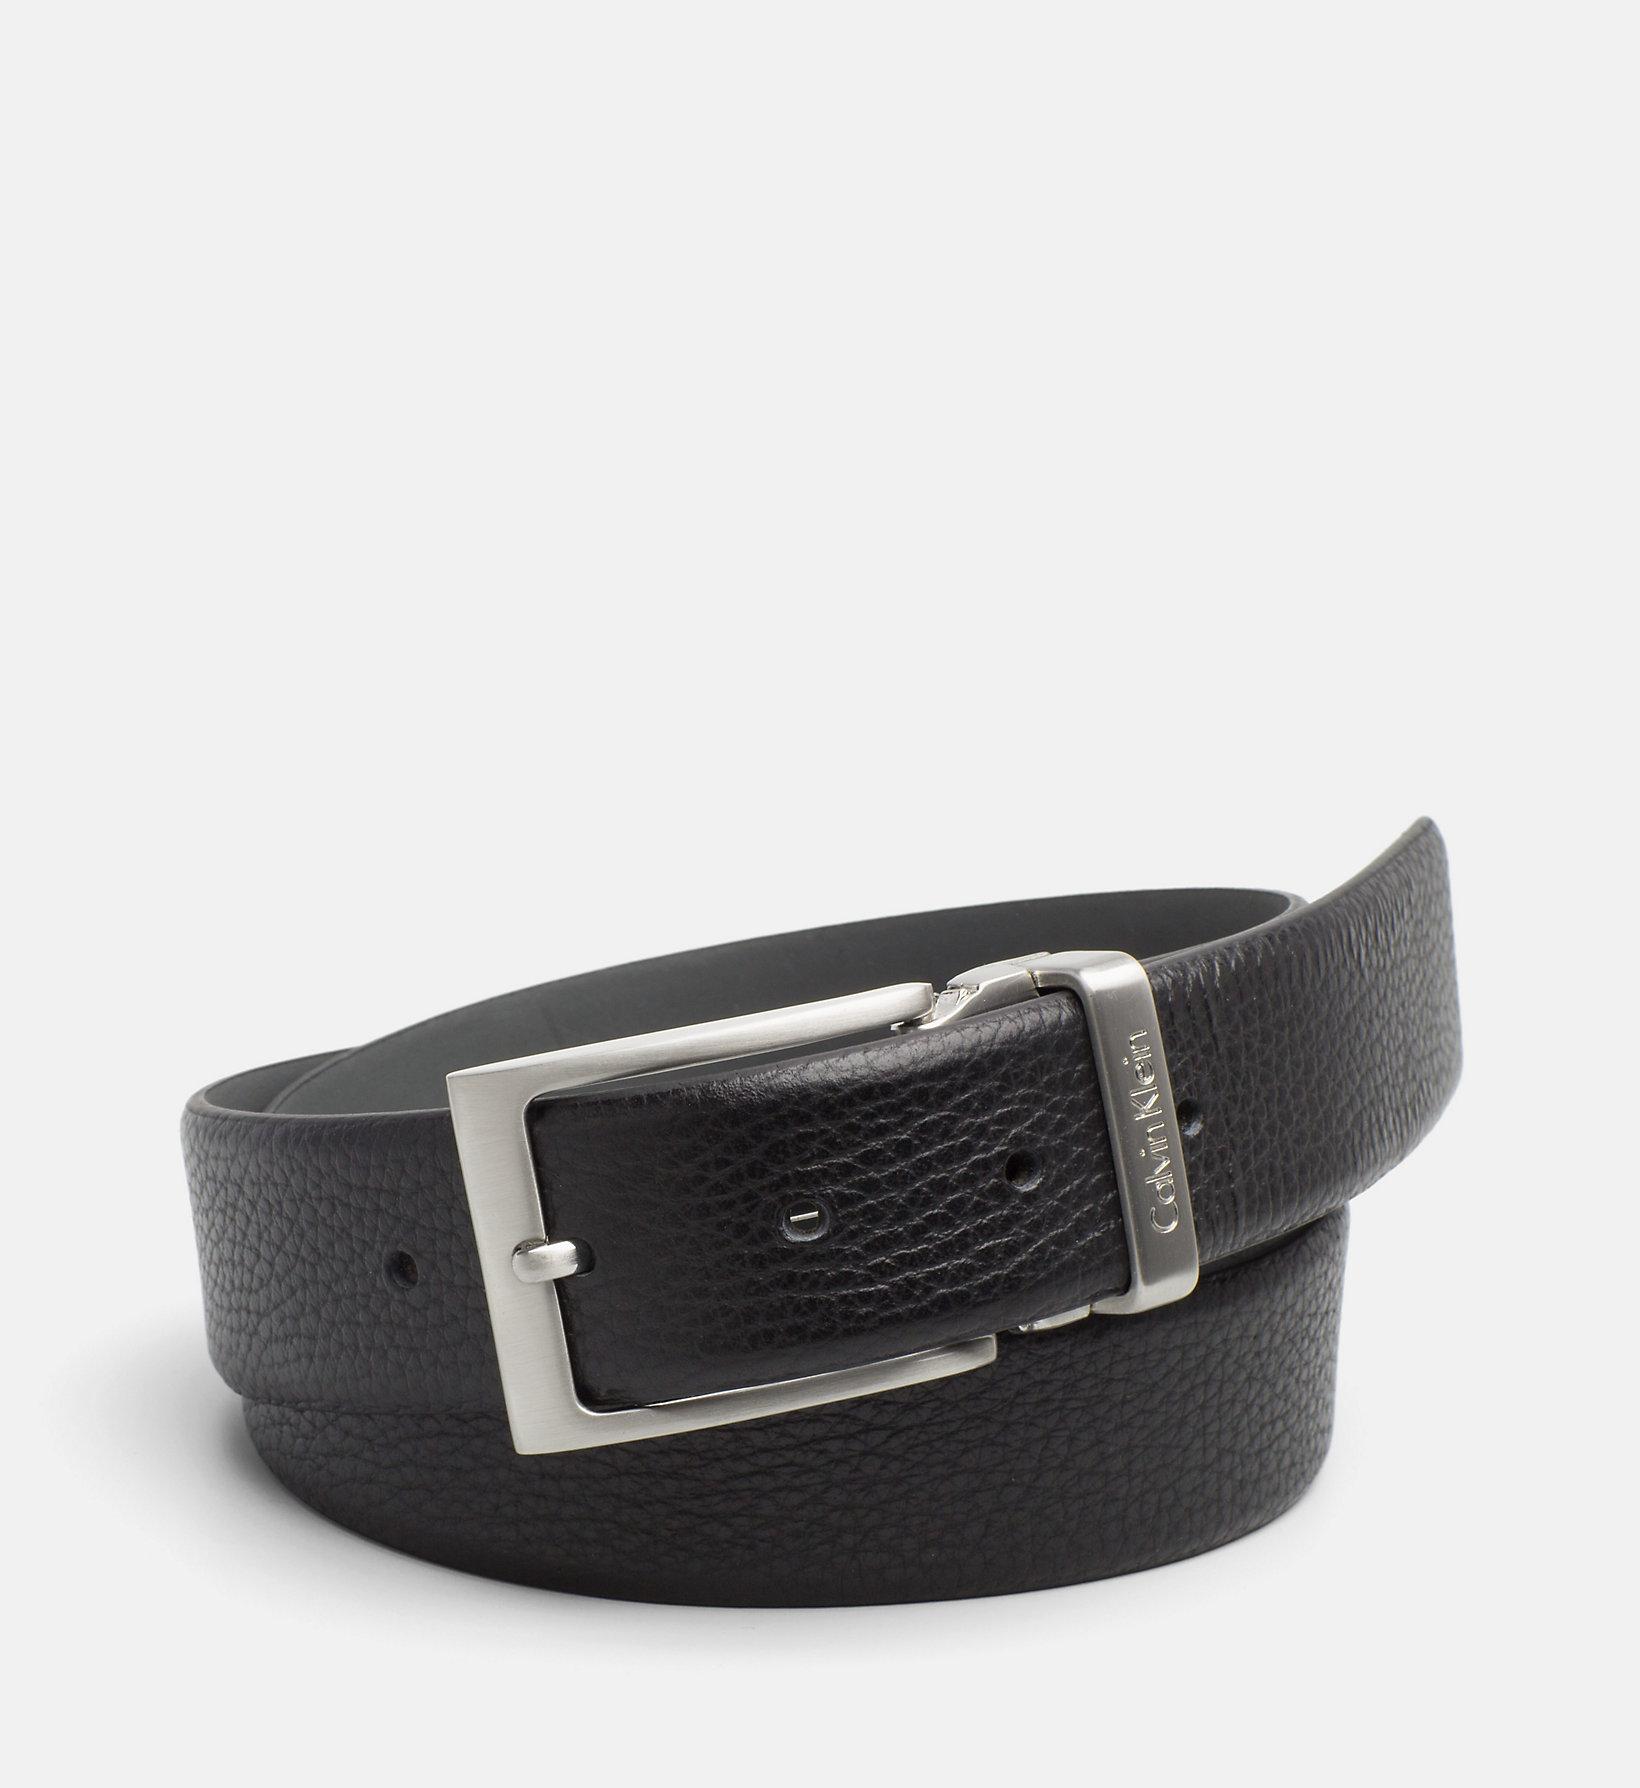 c3259c65c £55.00Pebbled Leather Belt. + More Colours